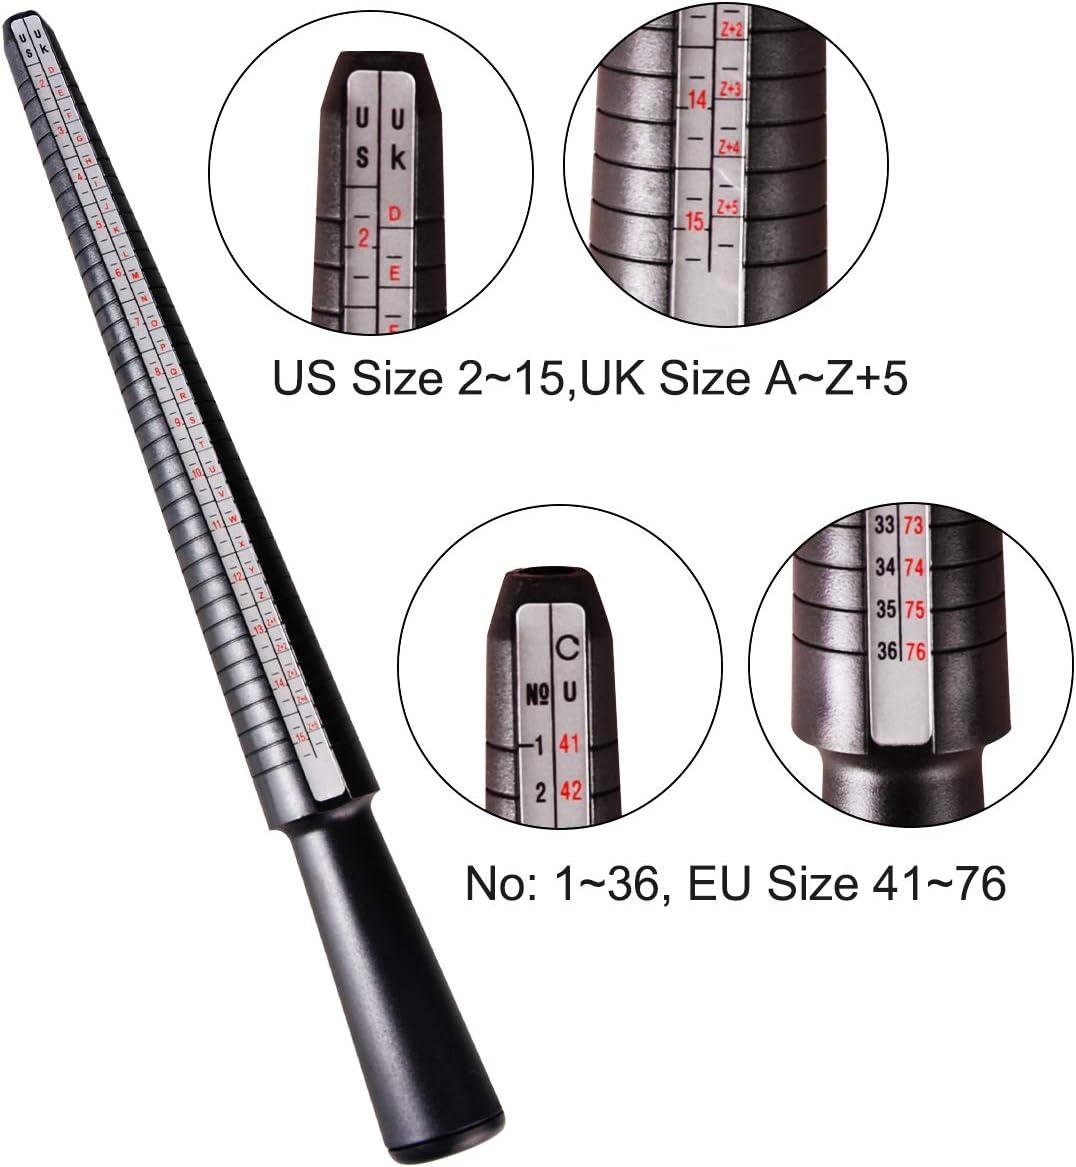 Meowoo Ring Sizer Measuring Tool Set Plastic Ring Sizer Mandrel and Finger Size Gauge US Ring Sizer 1-17 for Men Women 3 pcs